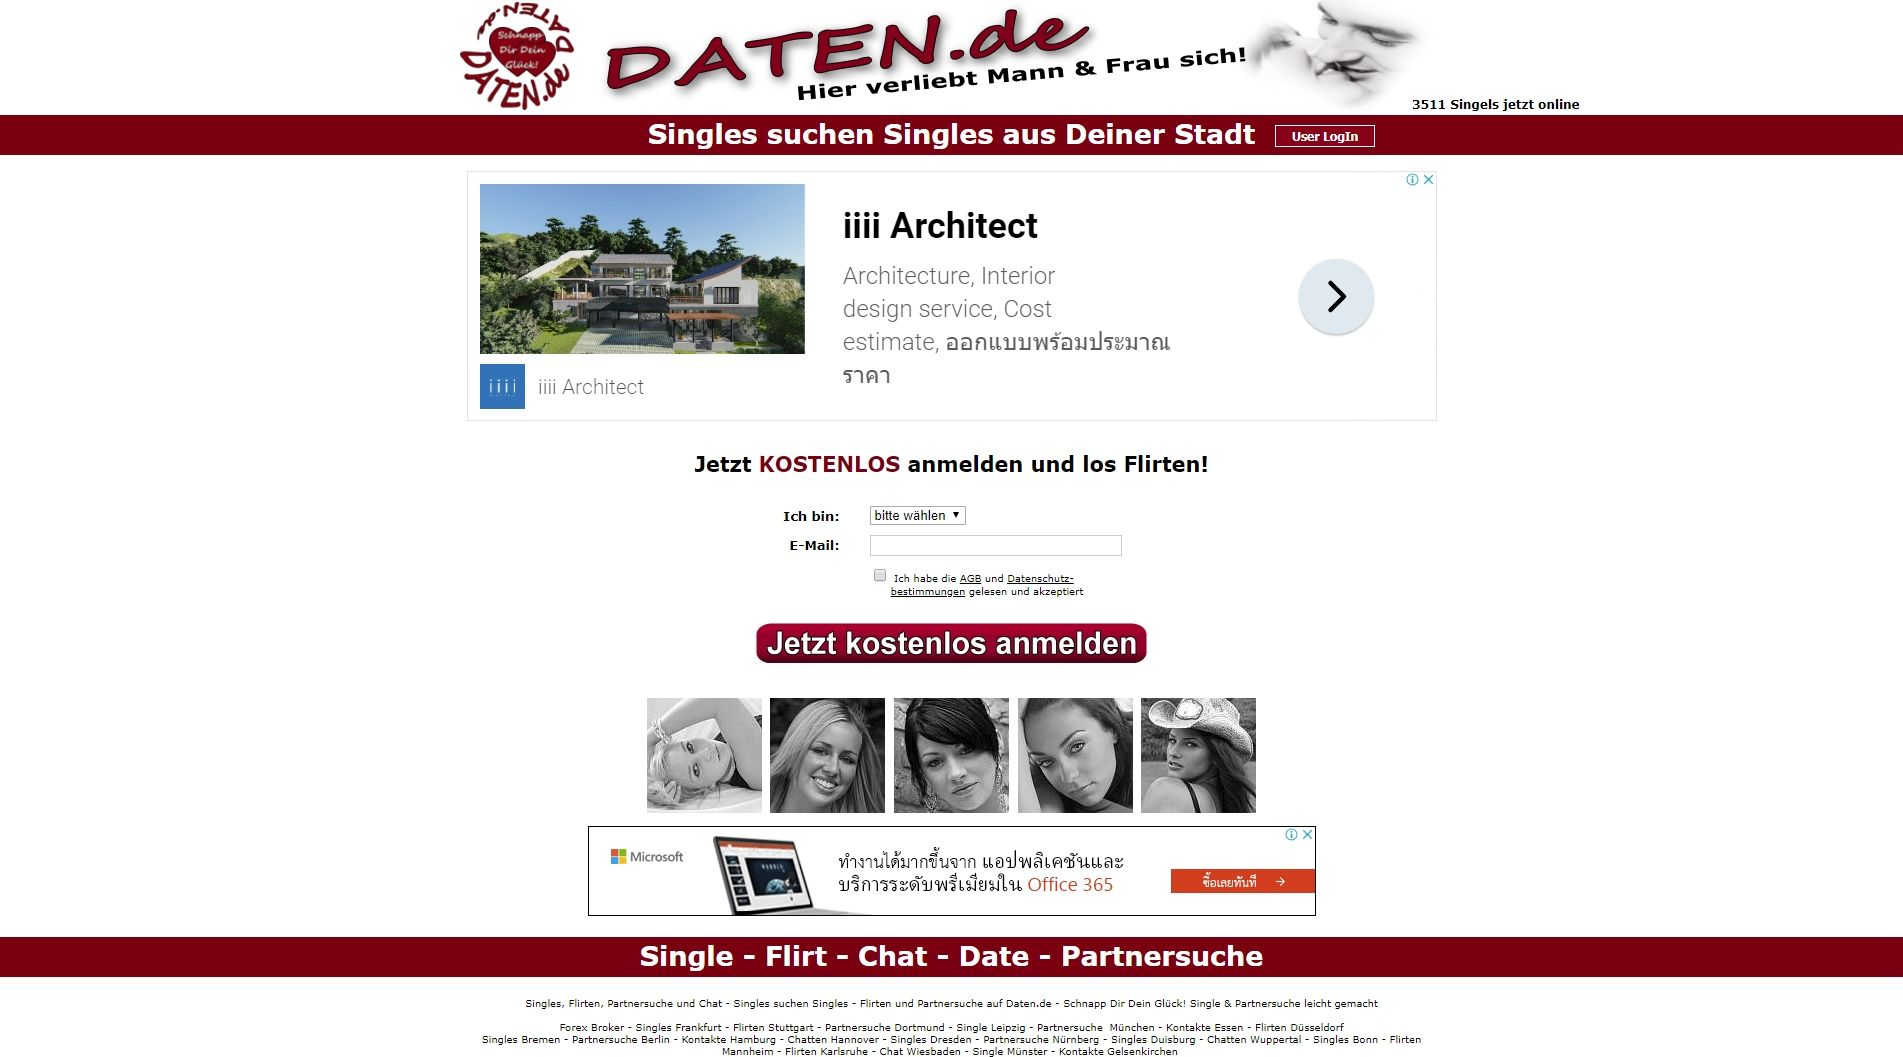 carolinavolksfolks.com - Online Dating